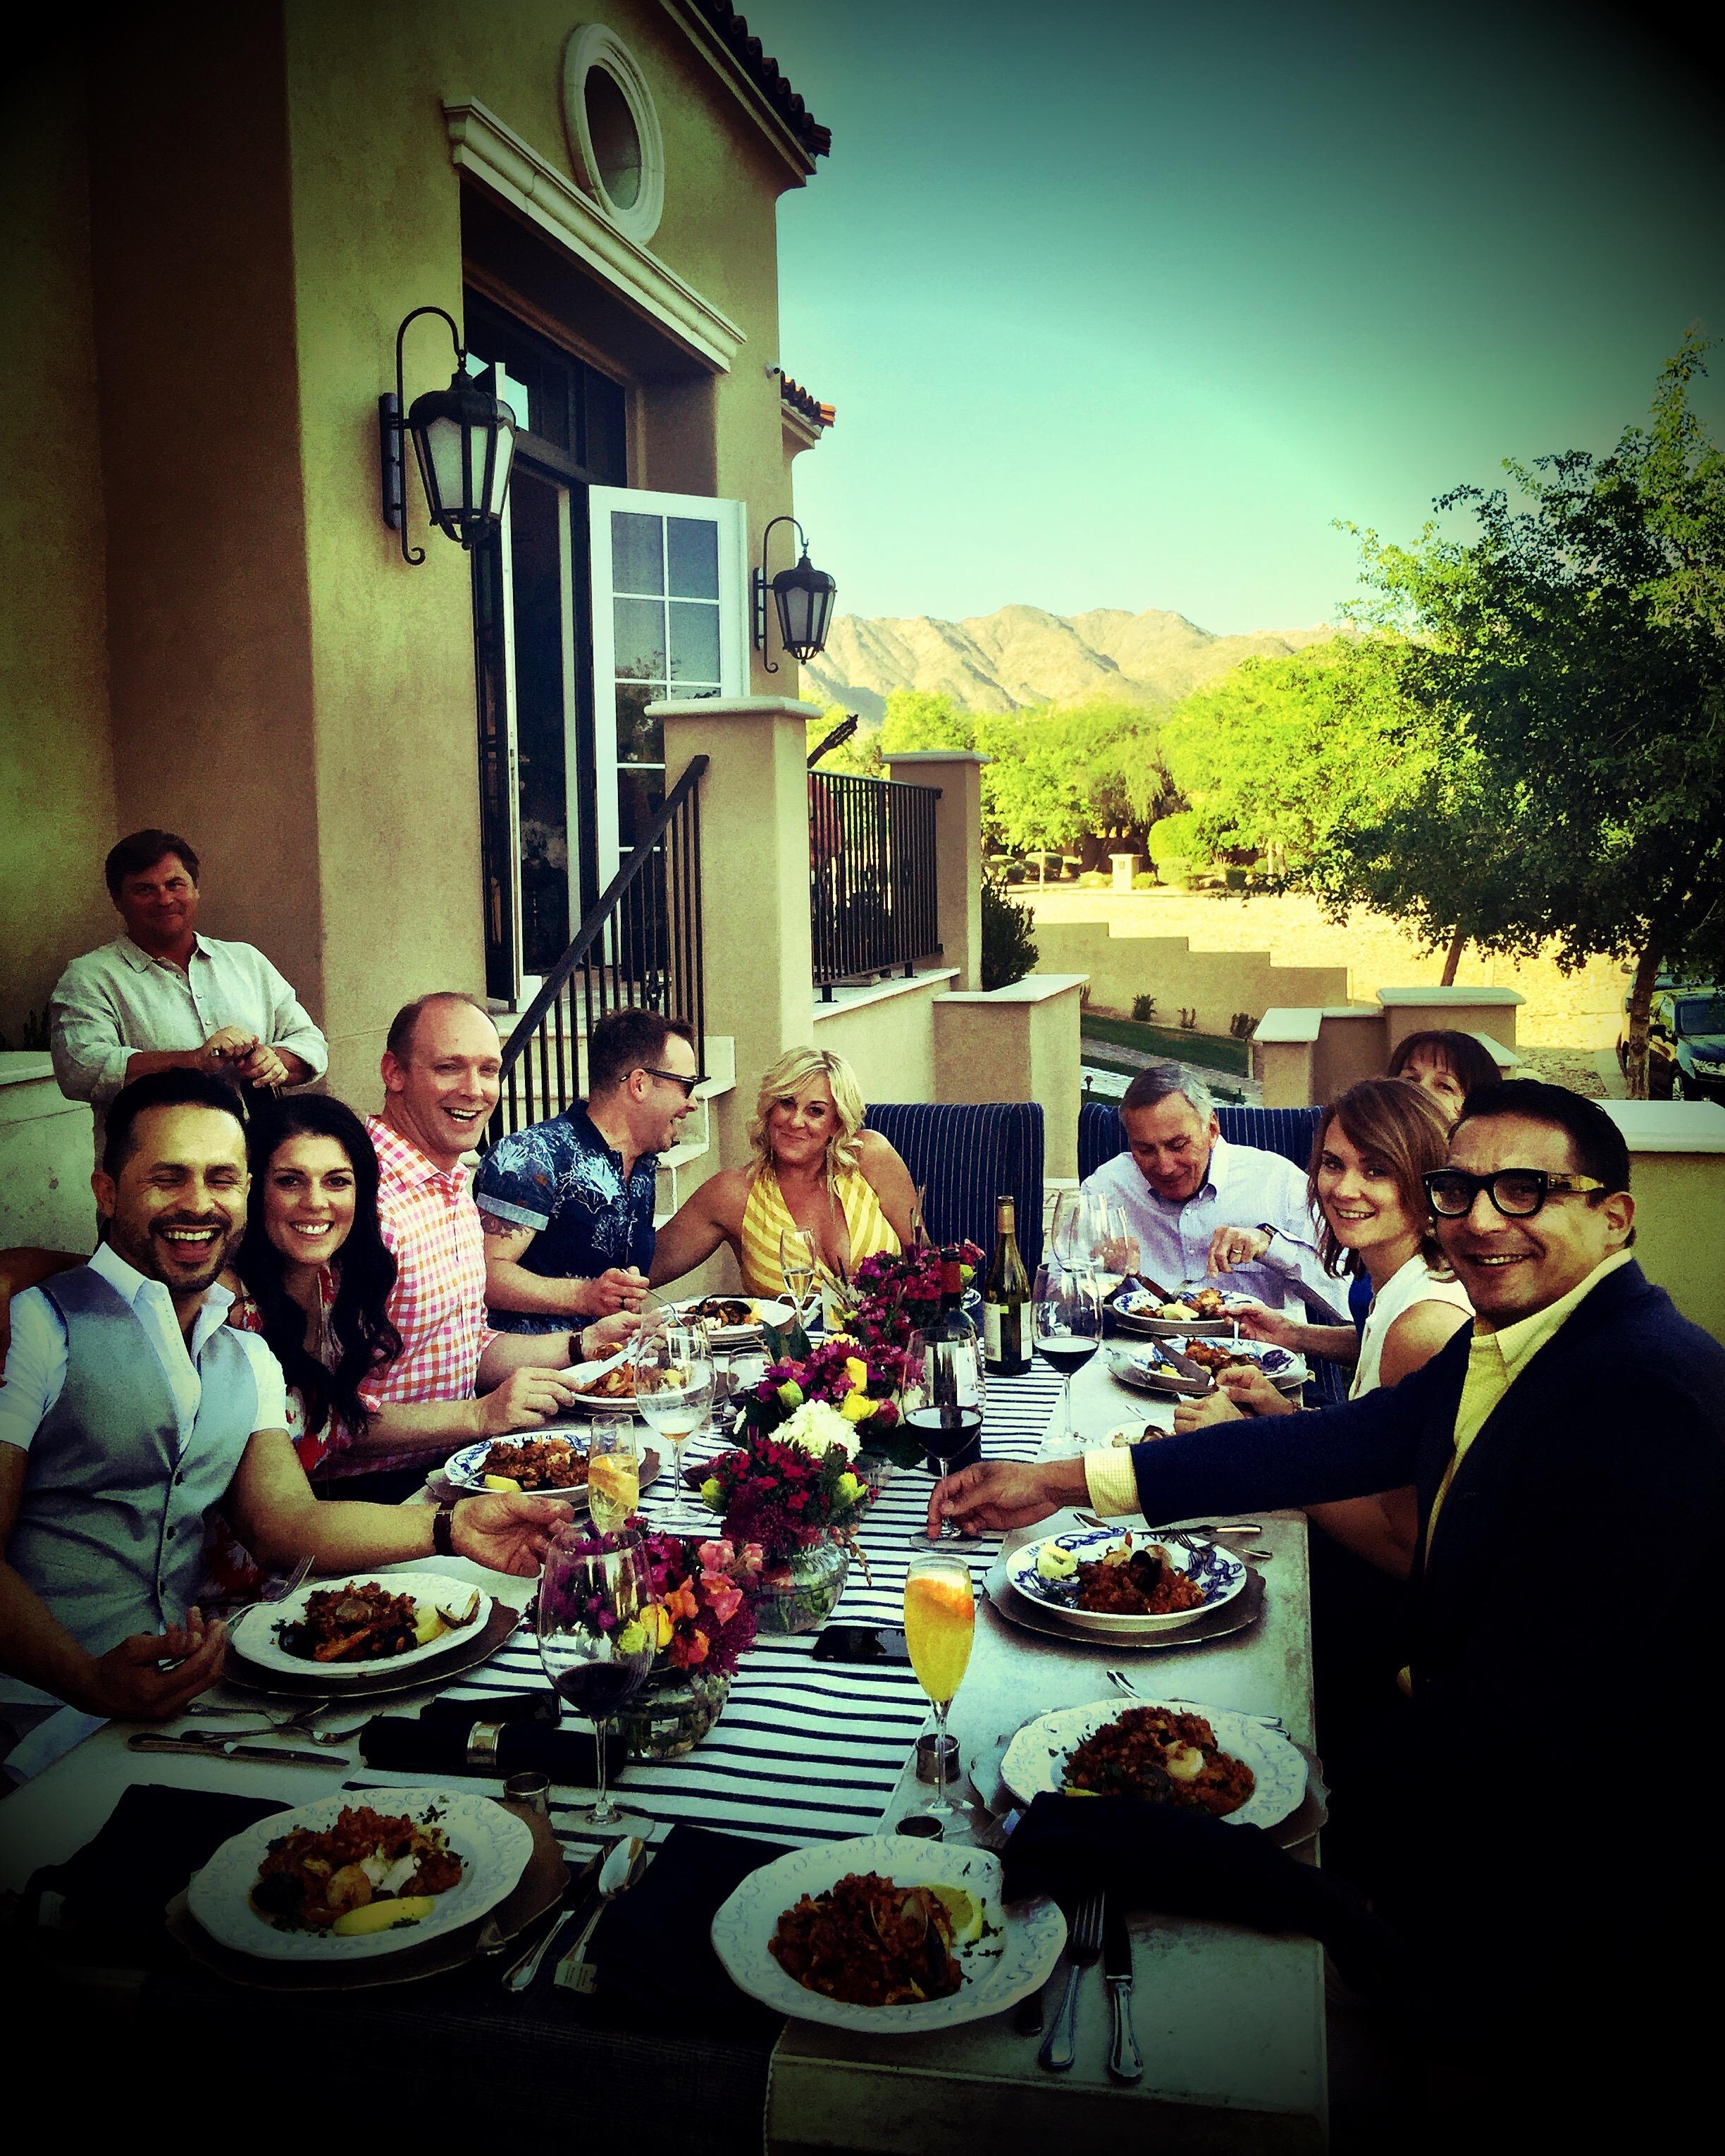 Housewarming party - enjoying my Paella!